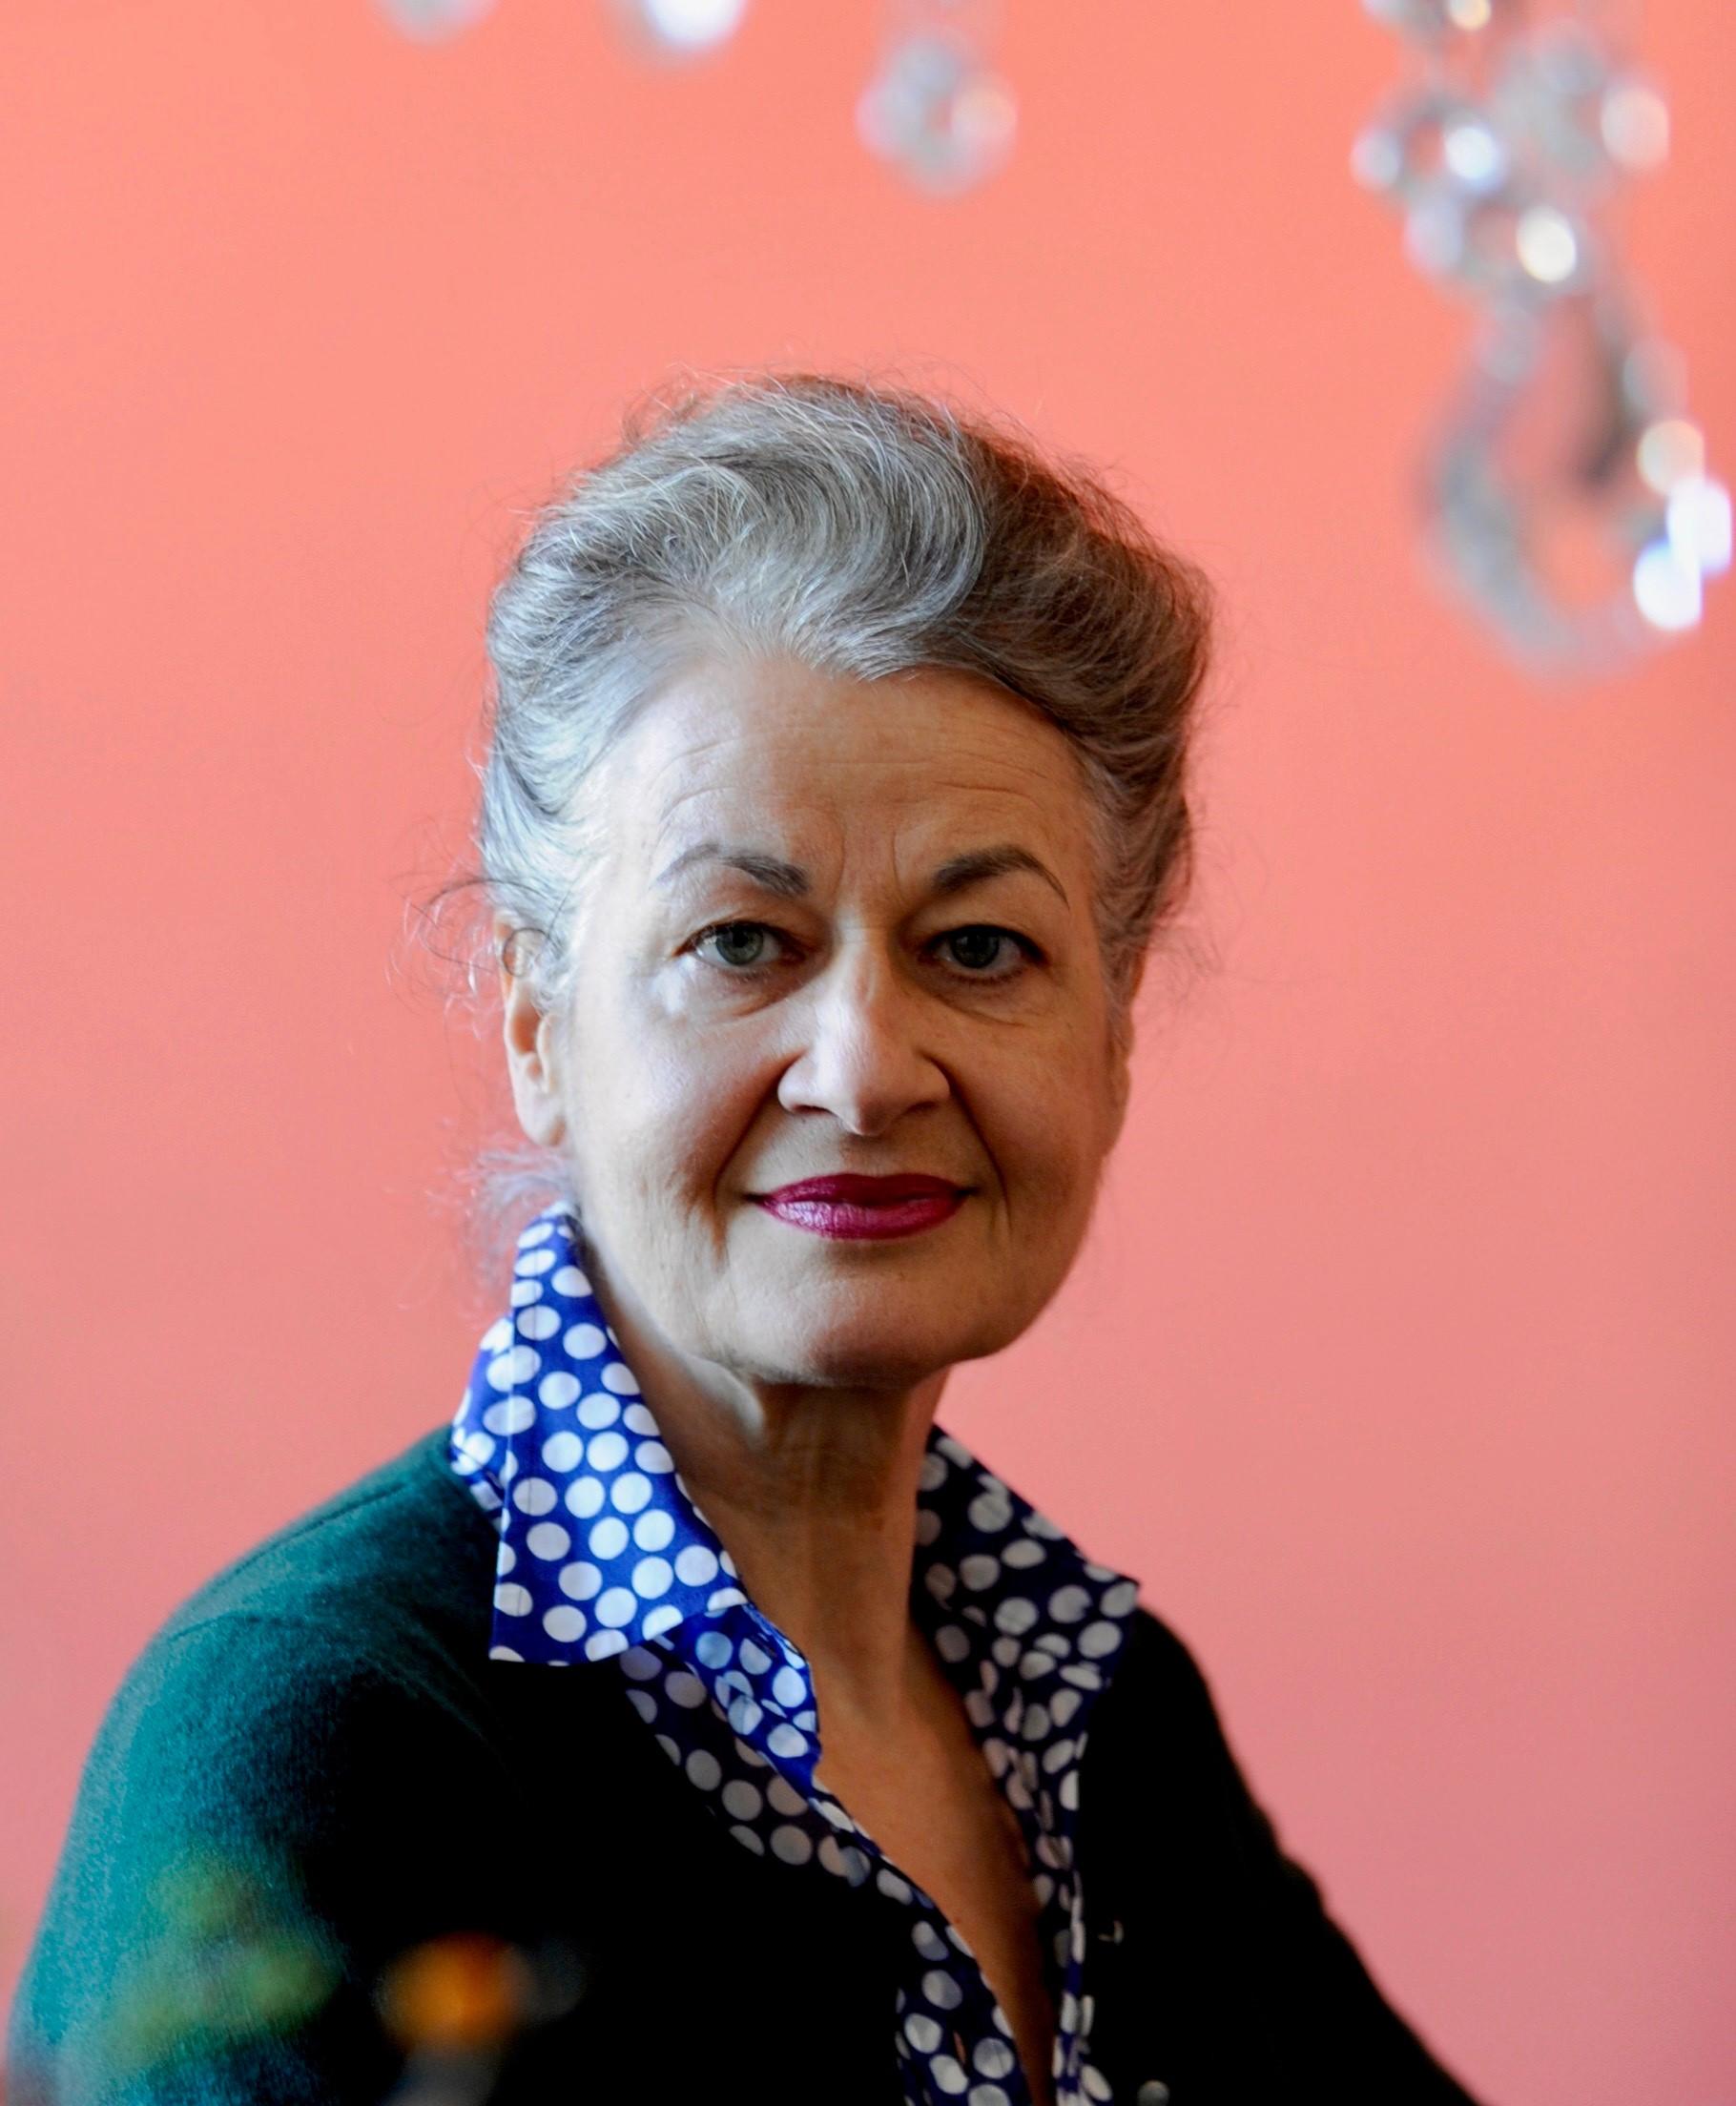 Portrait von Ursula Cantieni